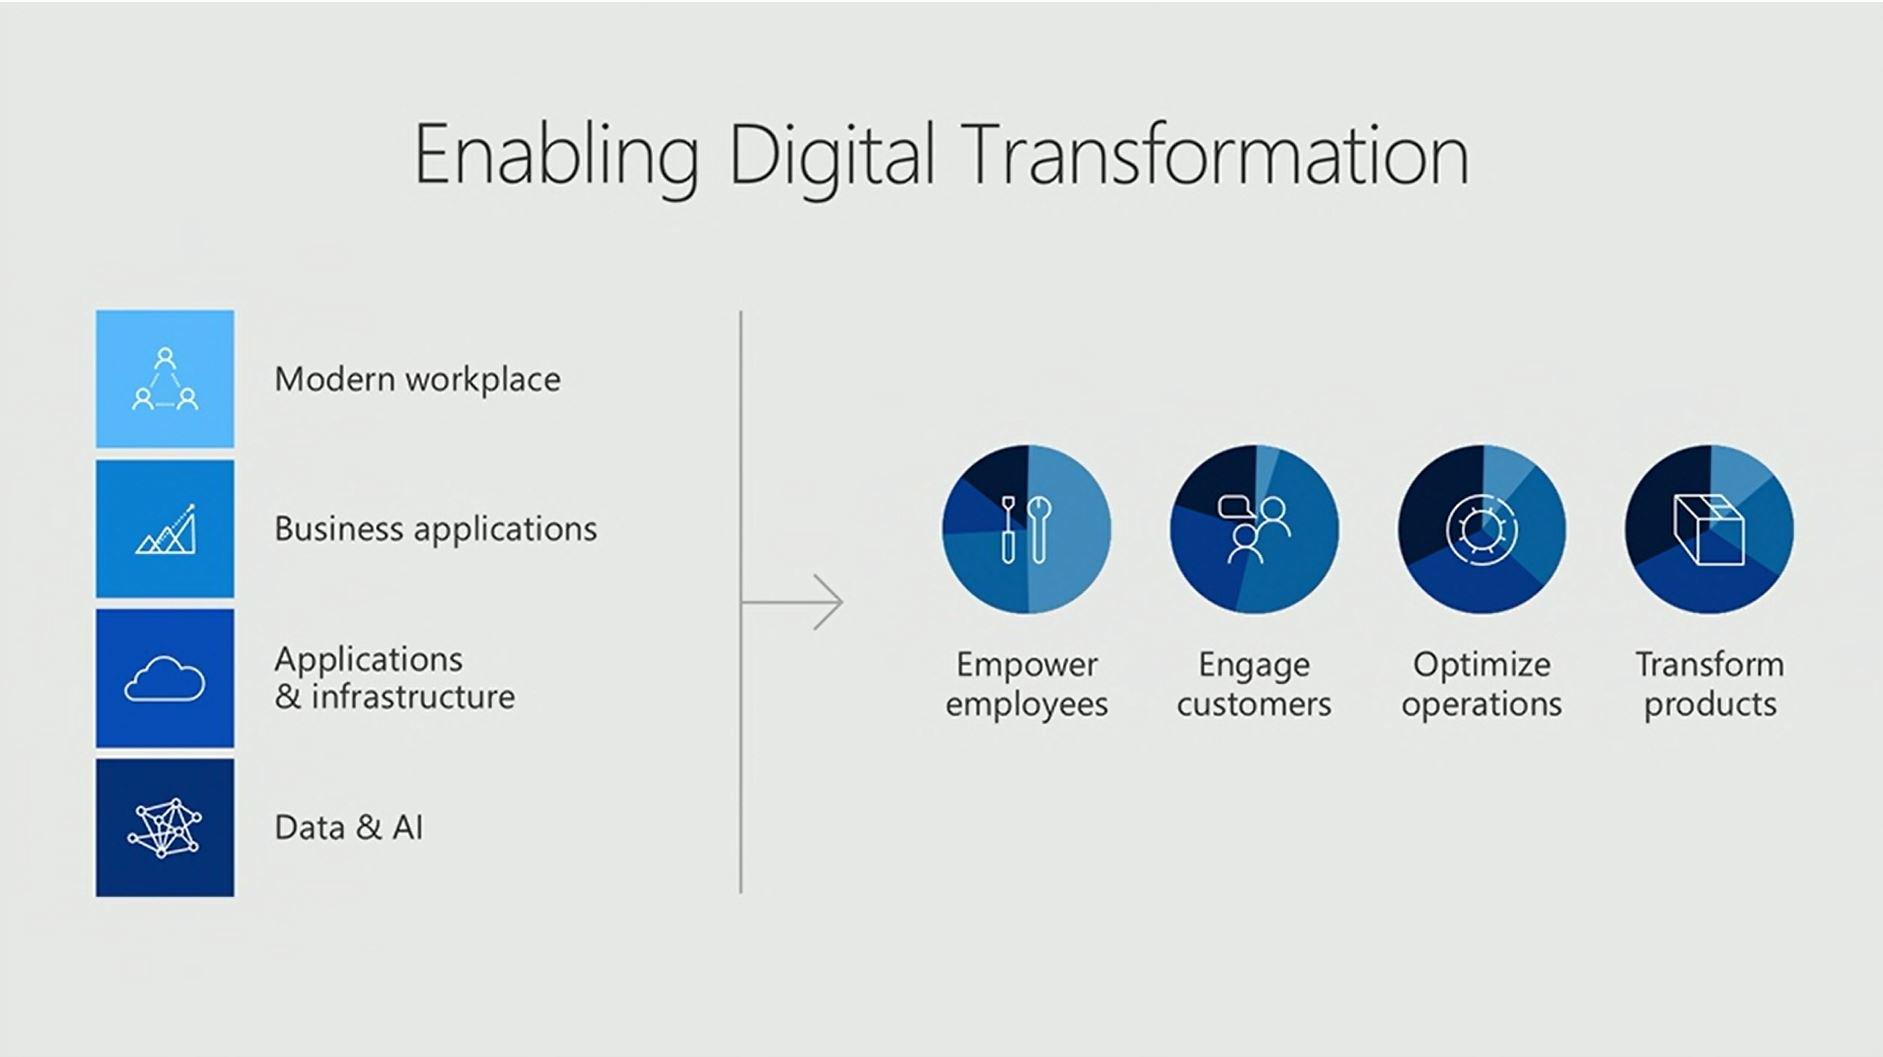 Empowering Digital Tranformation #msinspire https://t.co/a6qwXESBnL